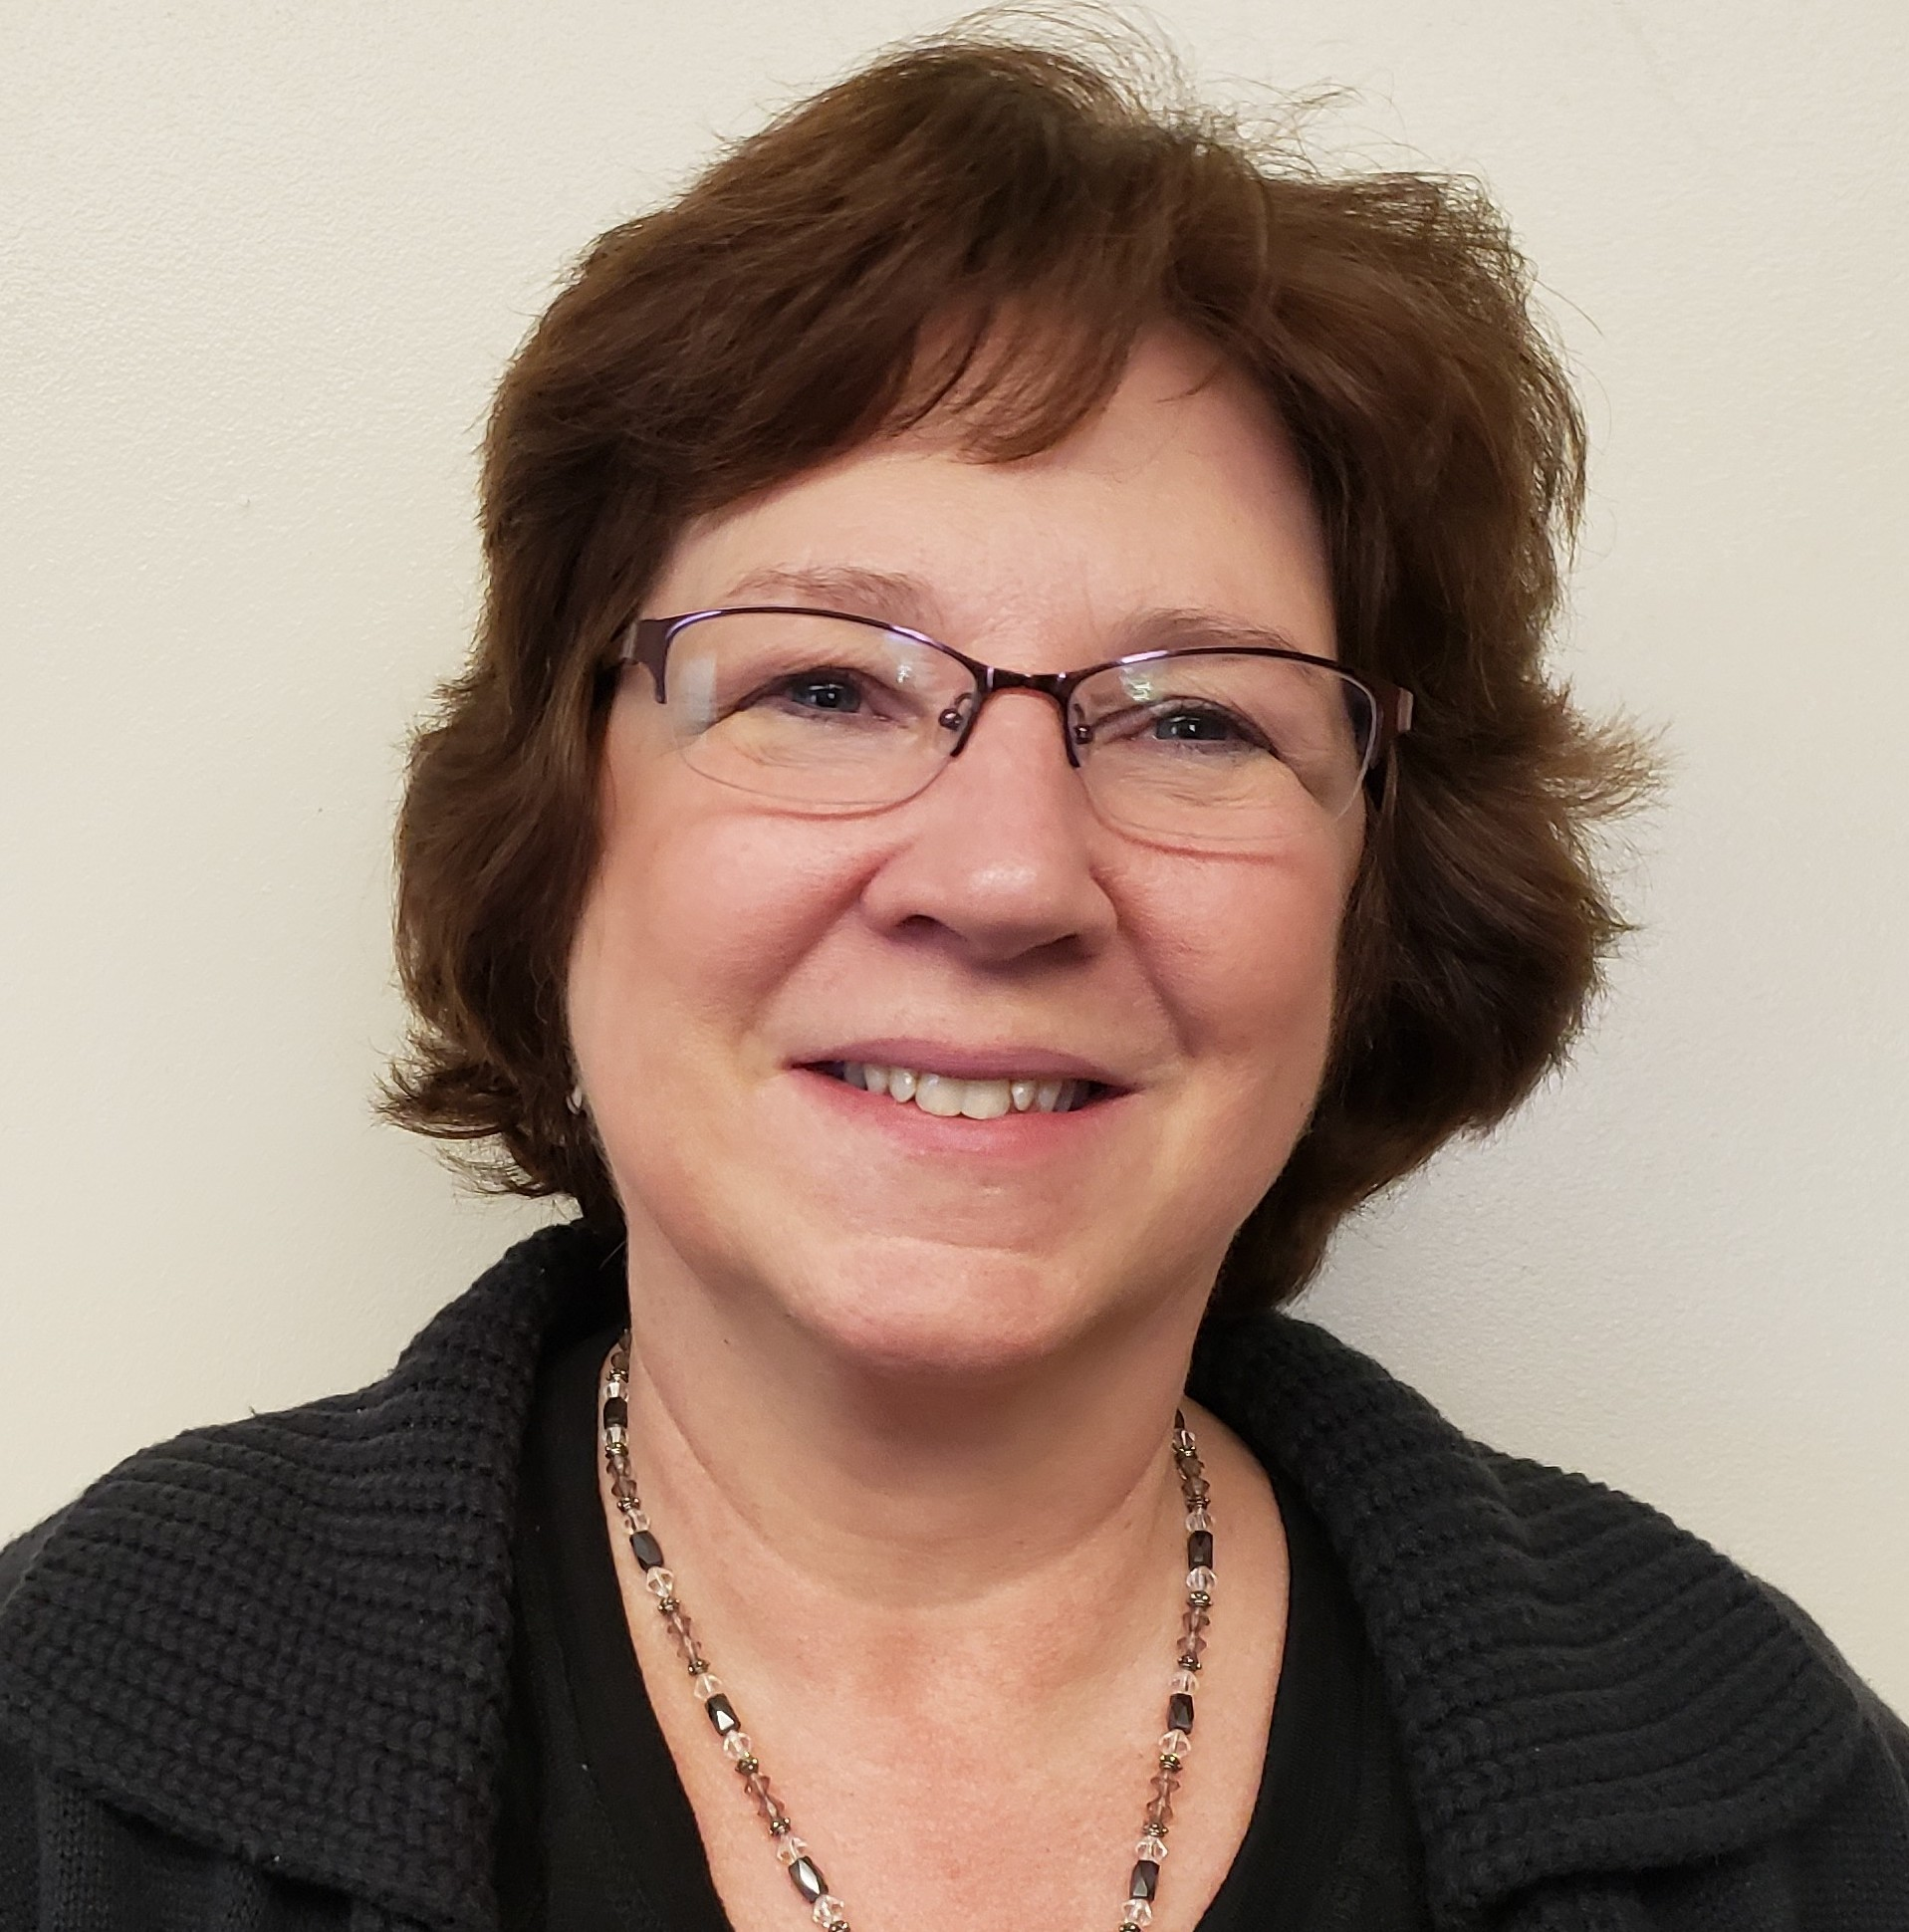 Connie Kistler